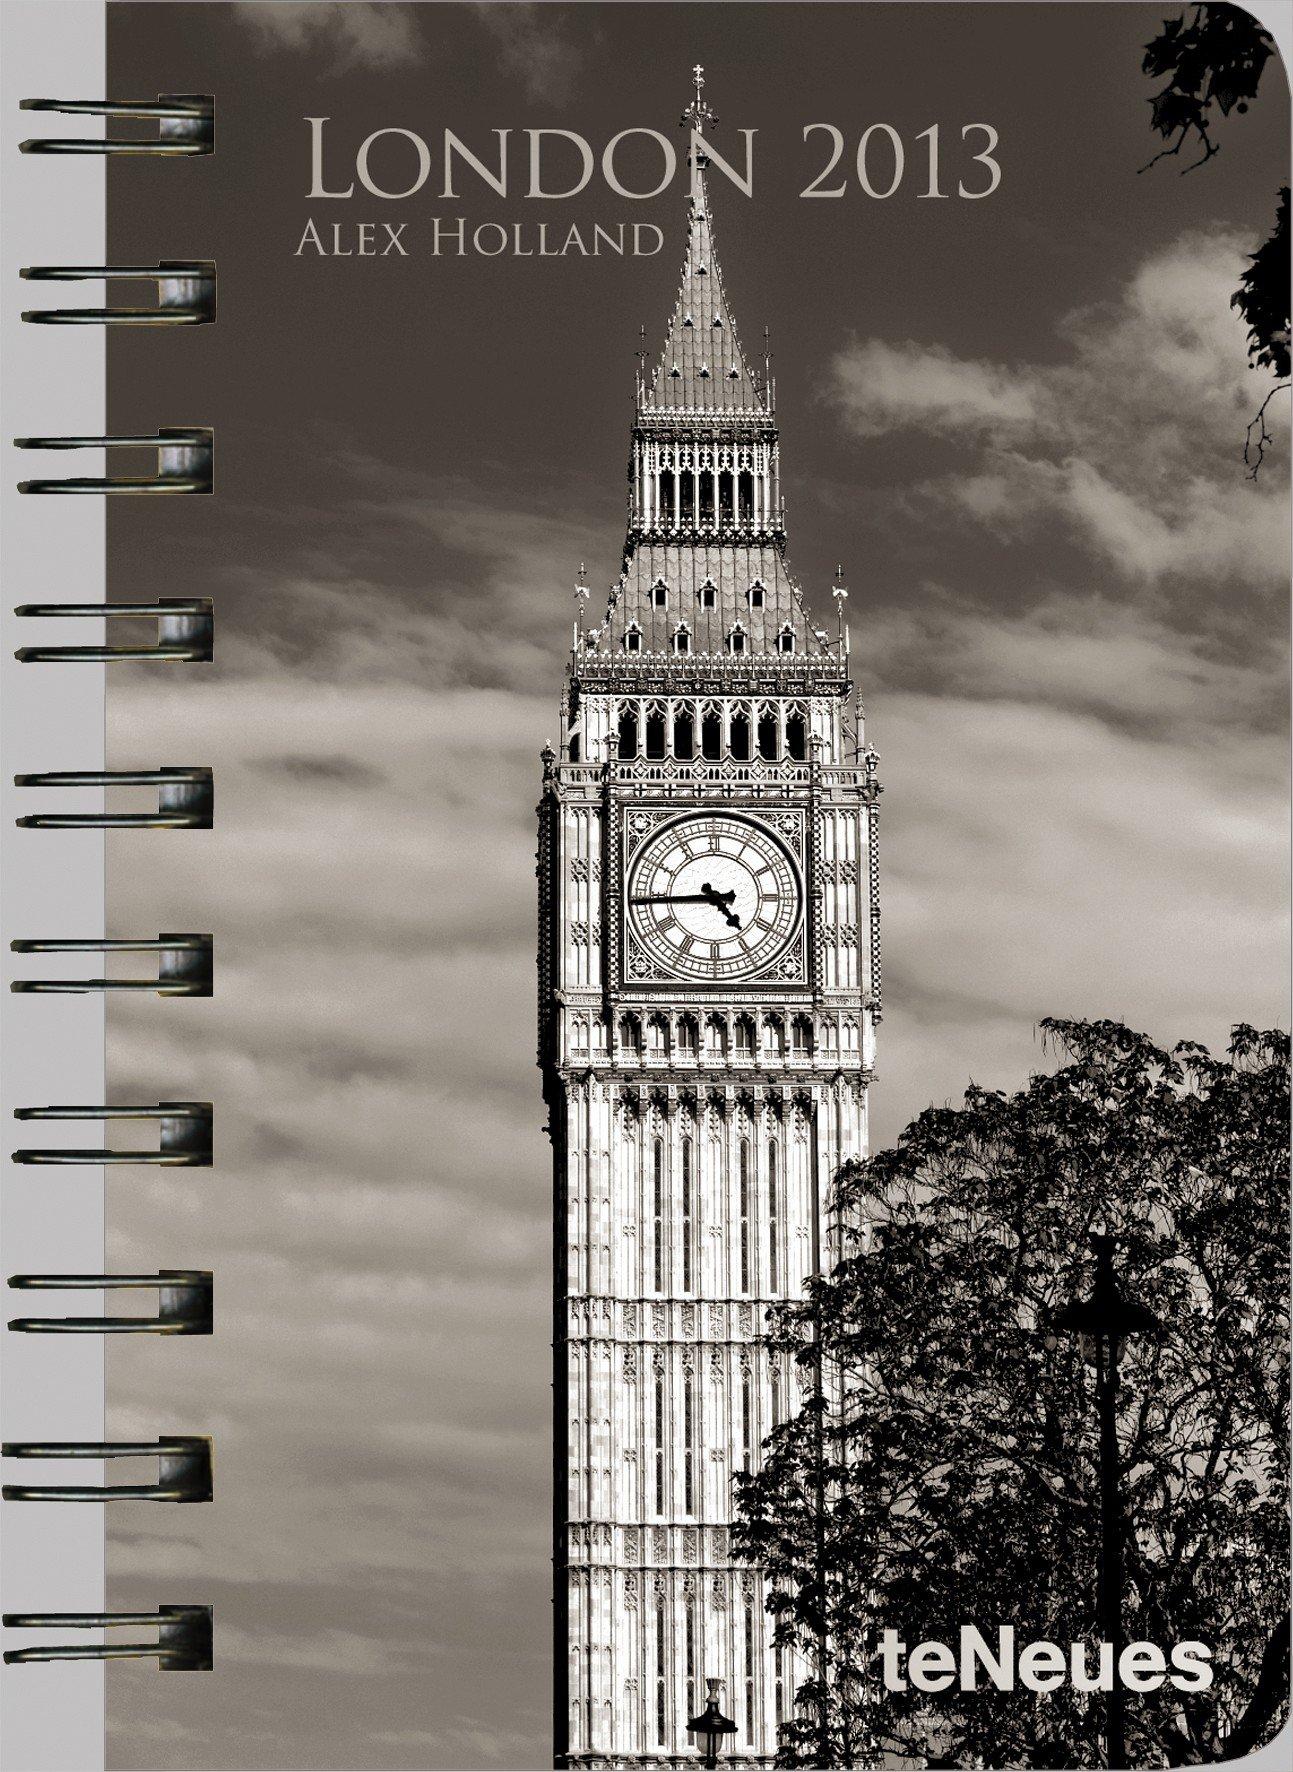 2012 through the lens engagement calendar